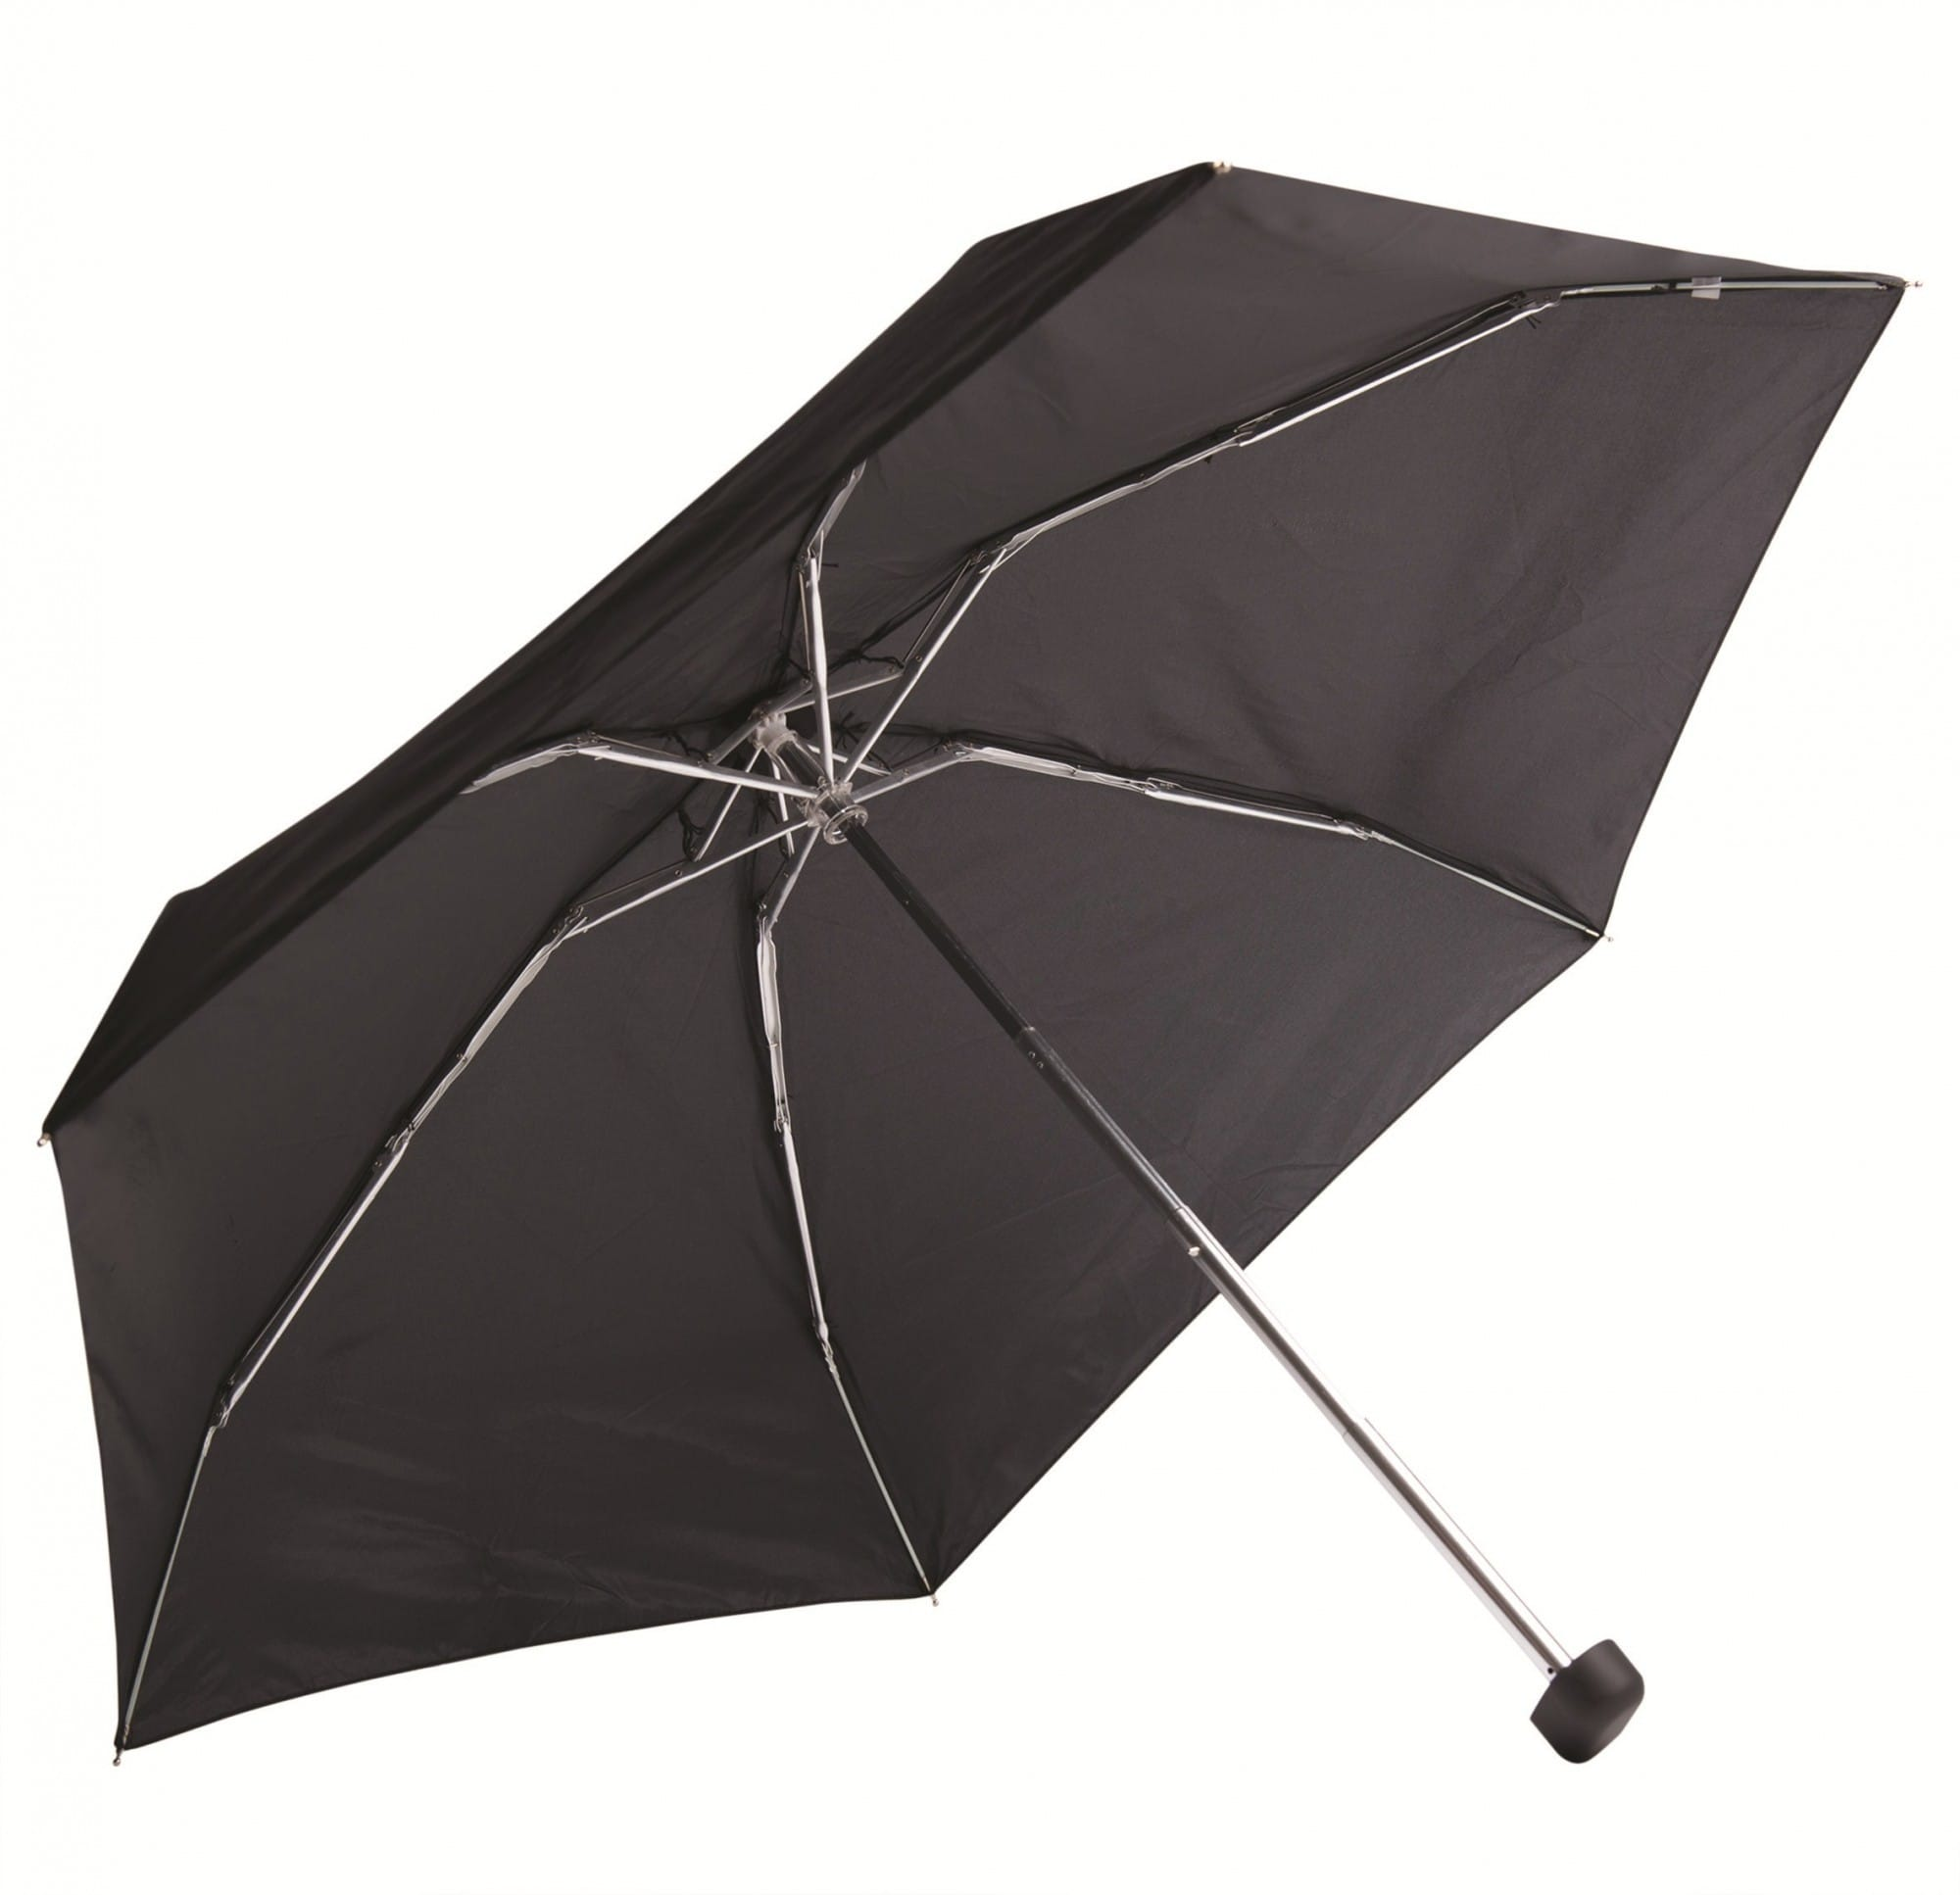 Sea to Summit Pocket Umbrella Schwarz, One Size -Farbe Black, One Size